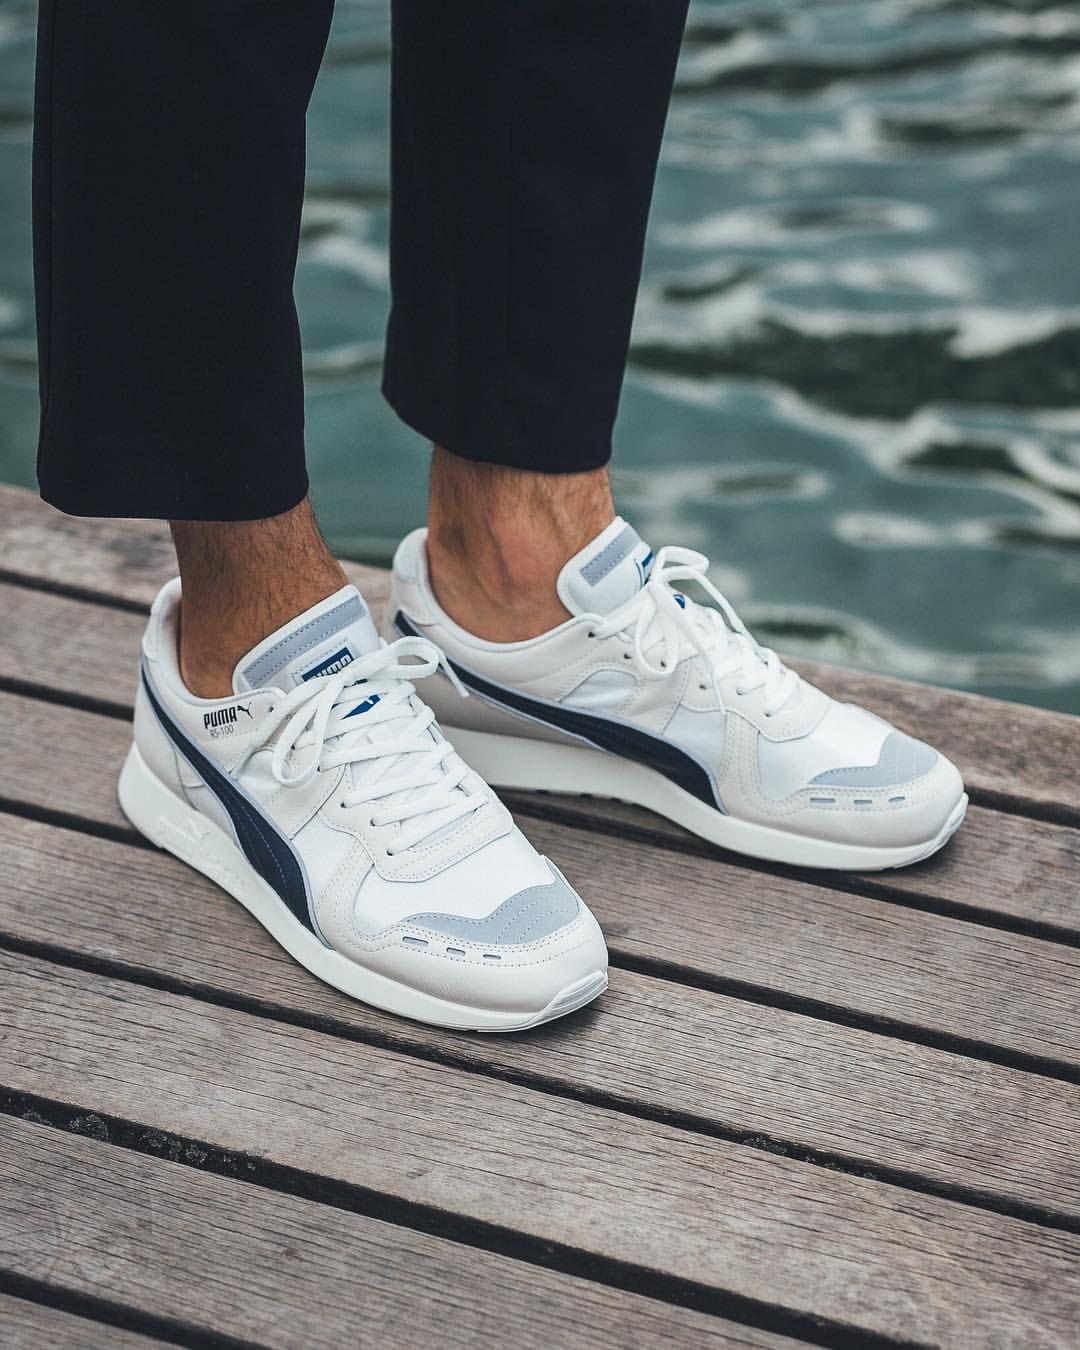 10cc575baa50fb Puma RS-100 PC  Vaporous Grey White Sneakers